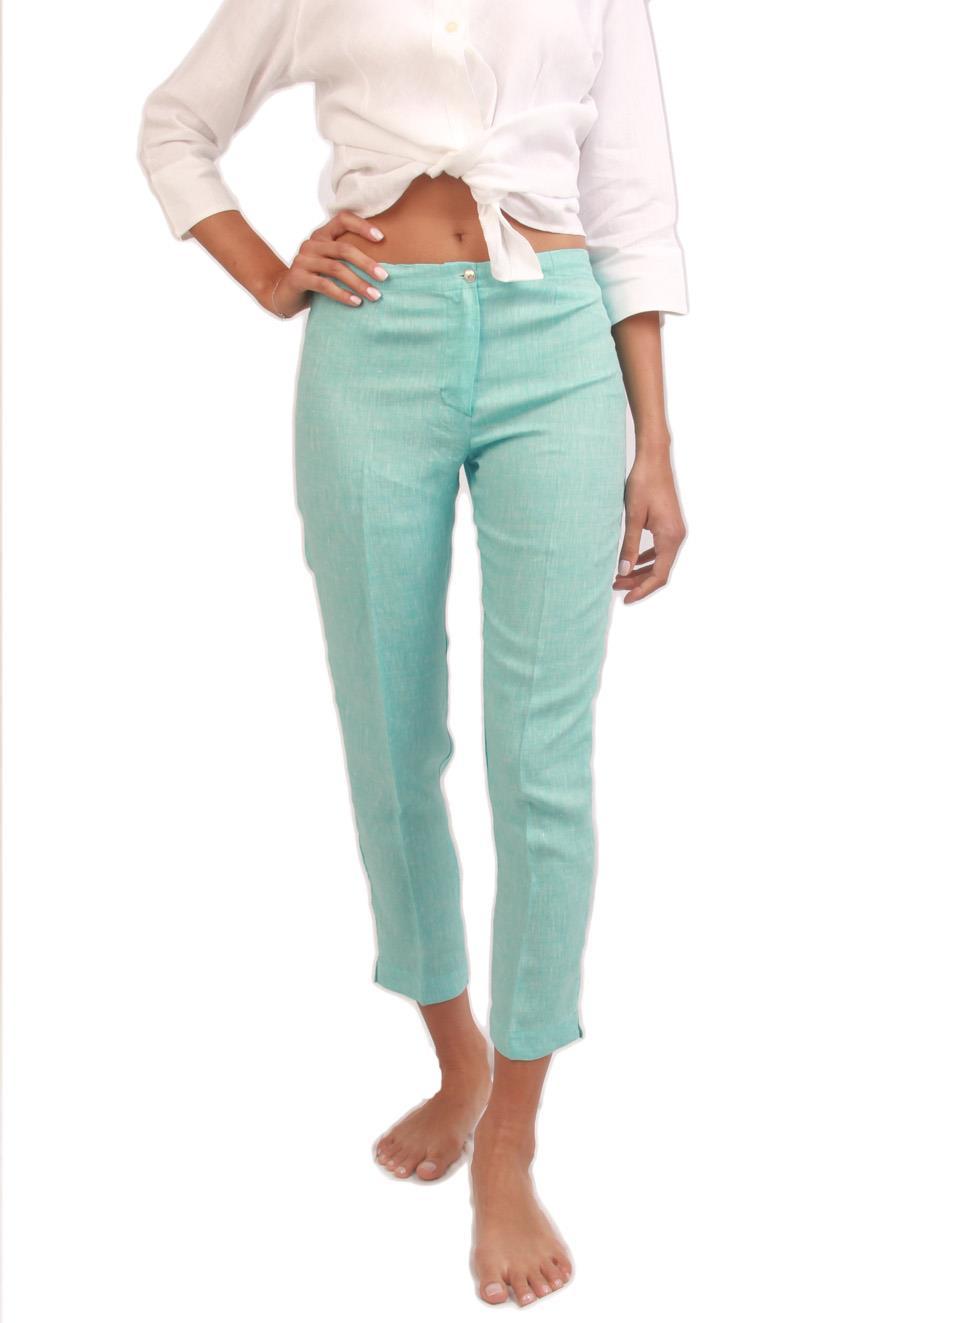 timeless design f4f2b 4904d Pantaloni stile Capri in puro lino turchese